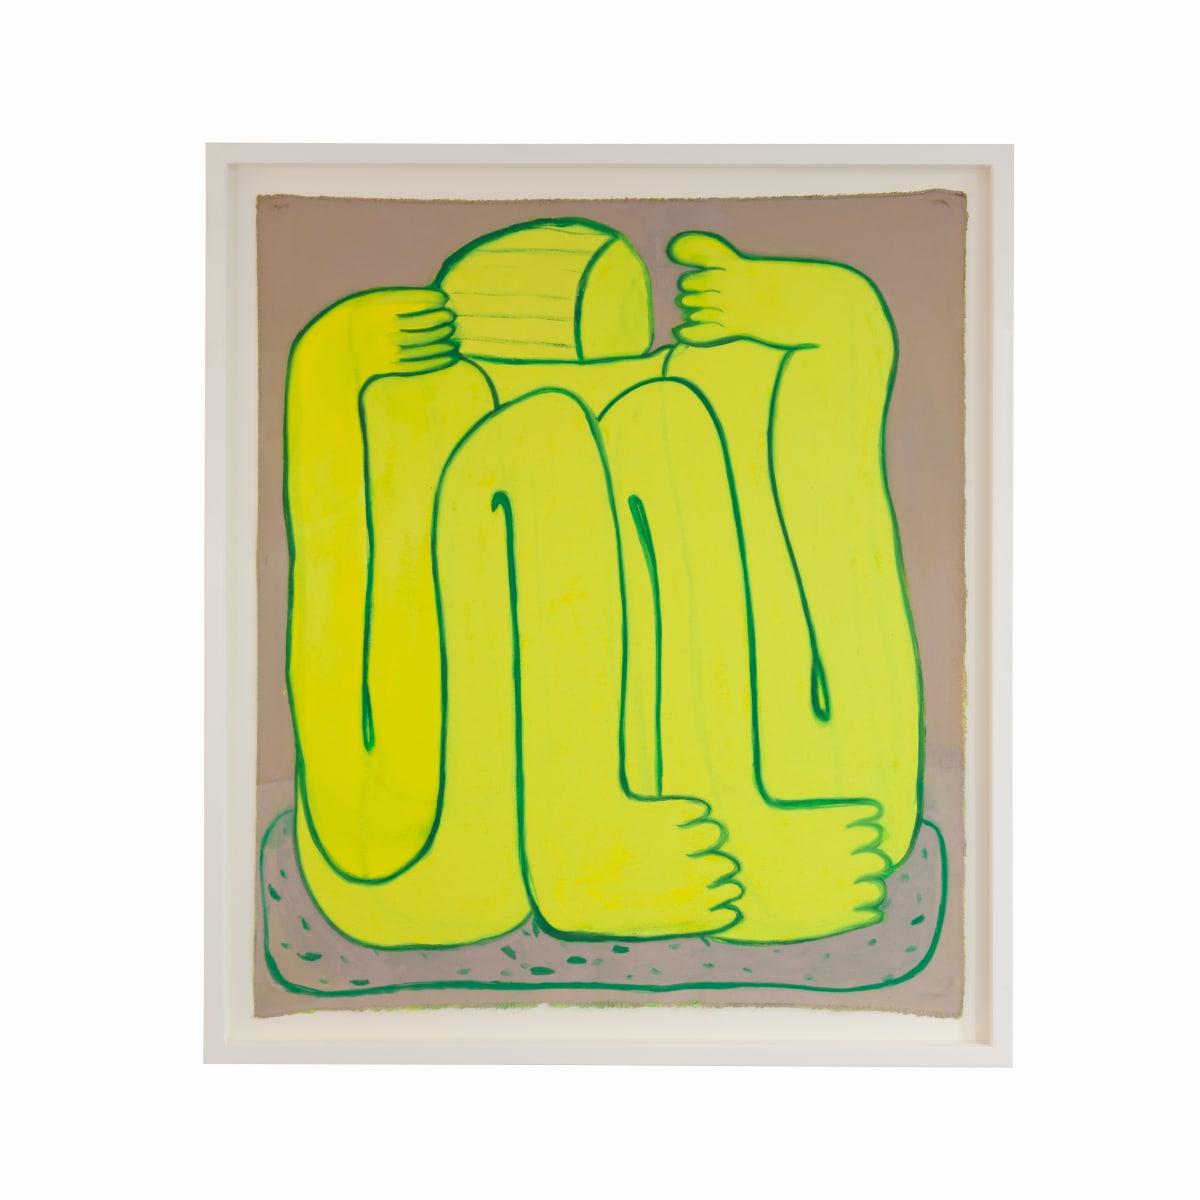 Tahnee Lonsdale Mr, 2018 - 2019 oil on canvas 100 x 85.5 cm 39 3/8 x 33 5/8 in